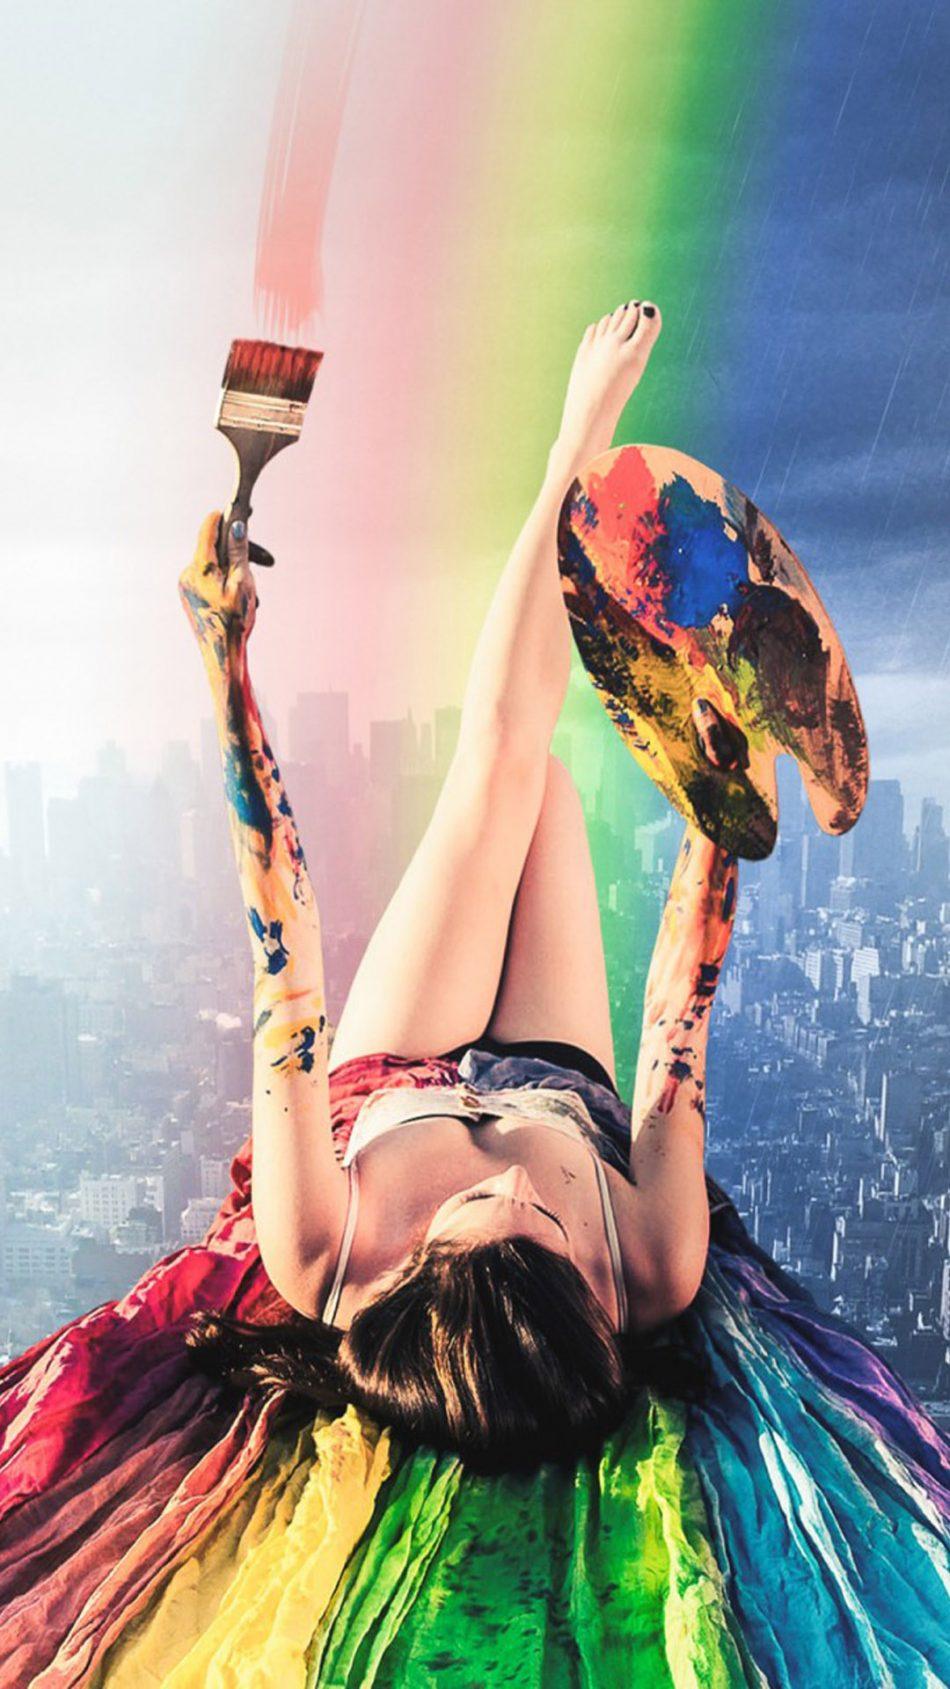 Rainbow Hot Girl Paint Cityscape HD Mobile Wallpaper